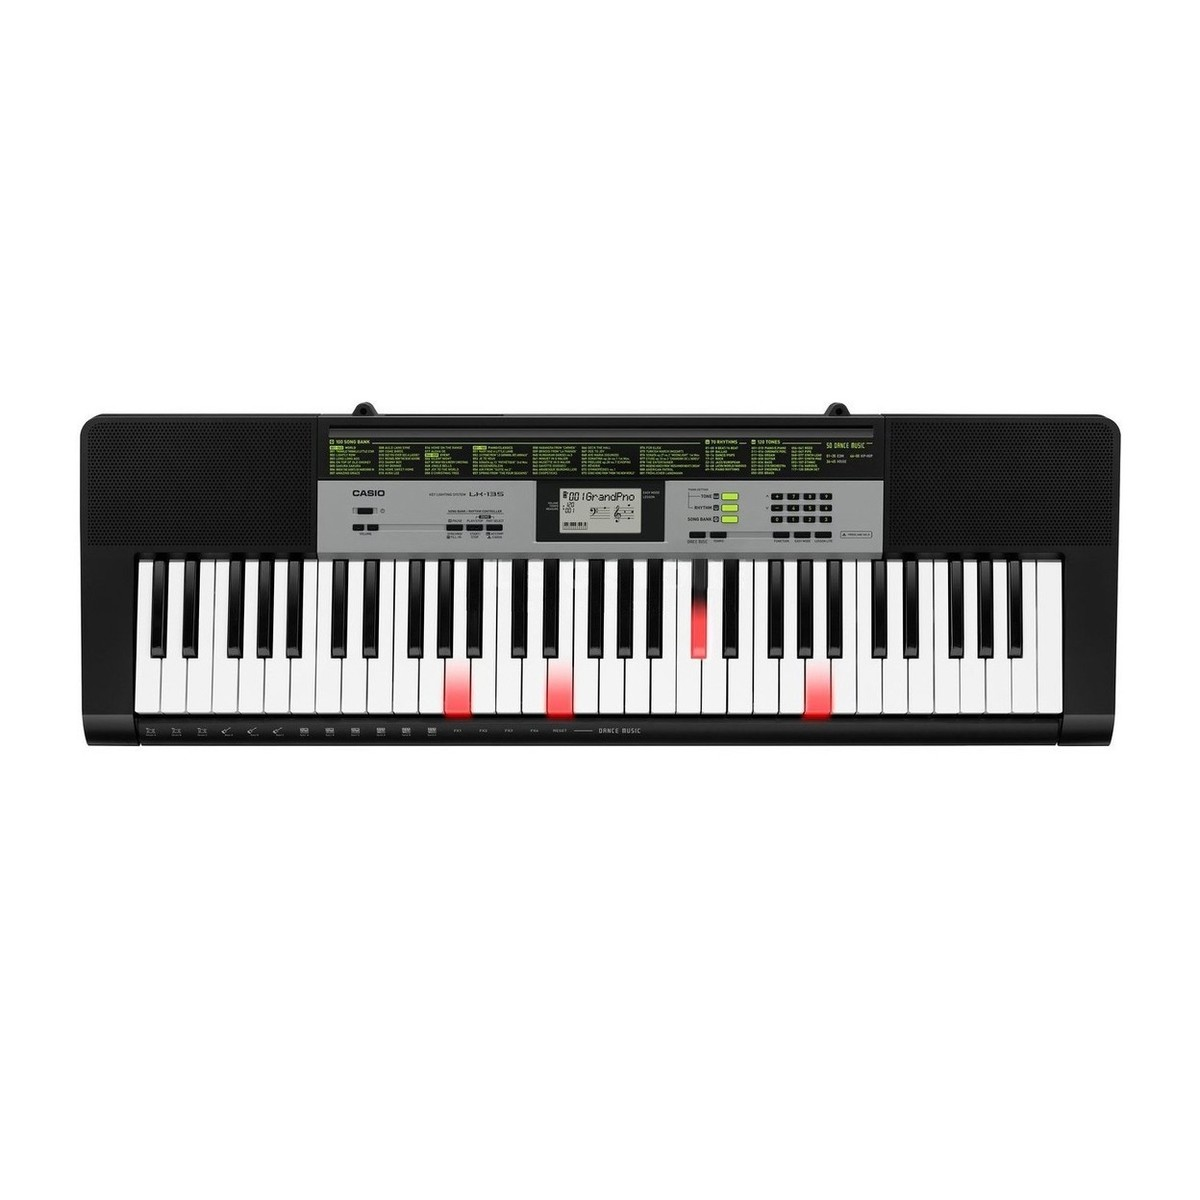 Casio Lk 135 Portable Keylighting Keyboard Black B